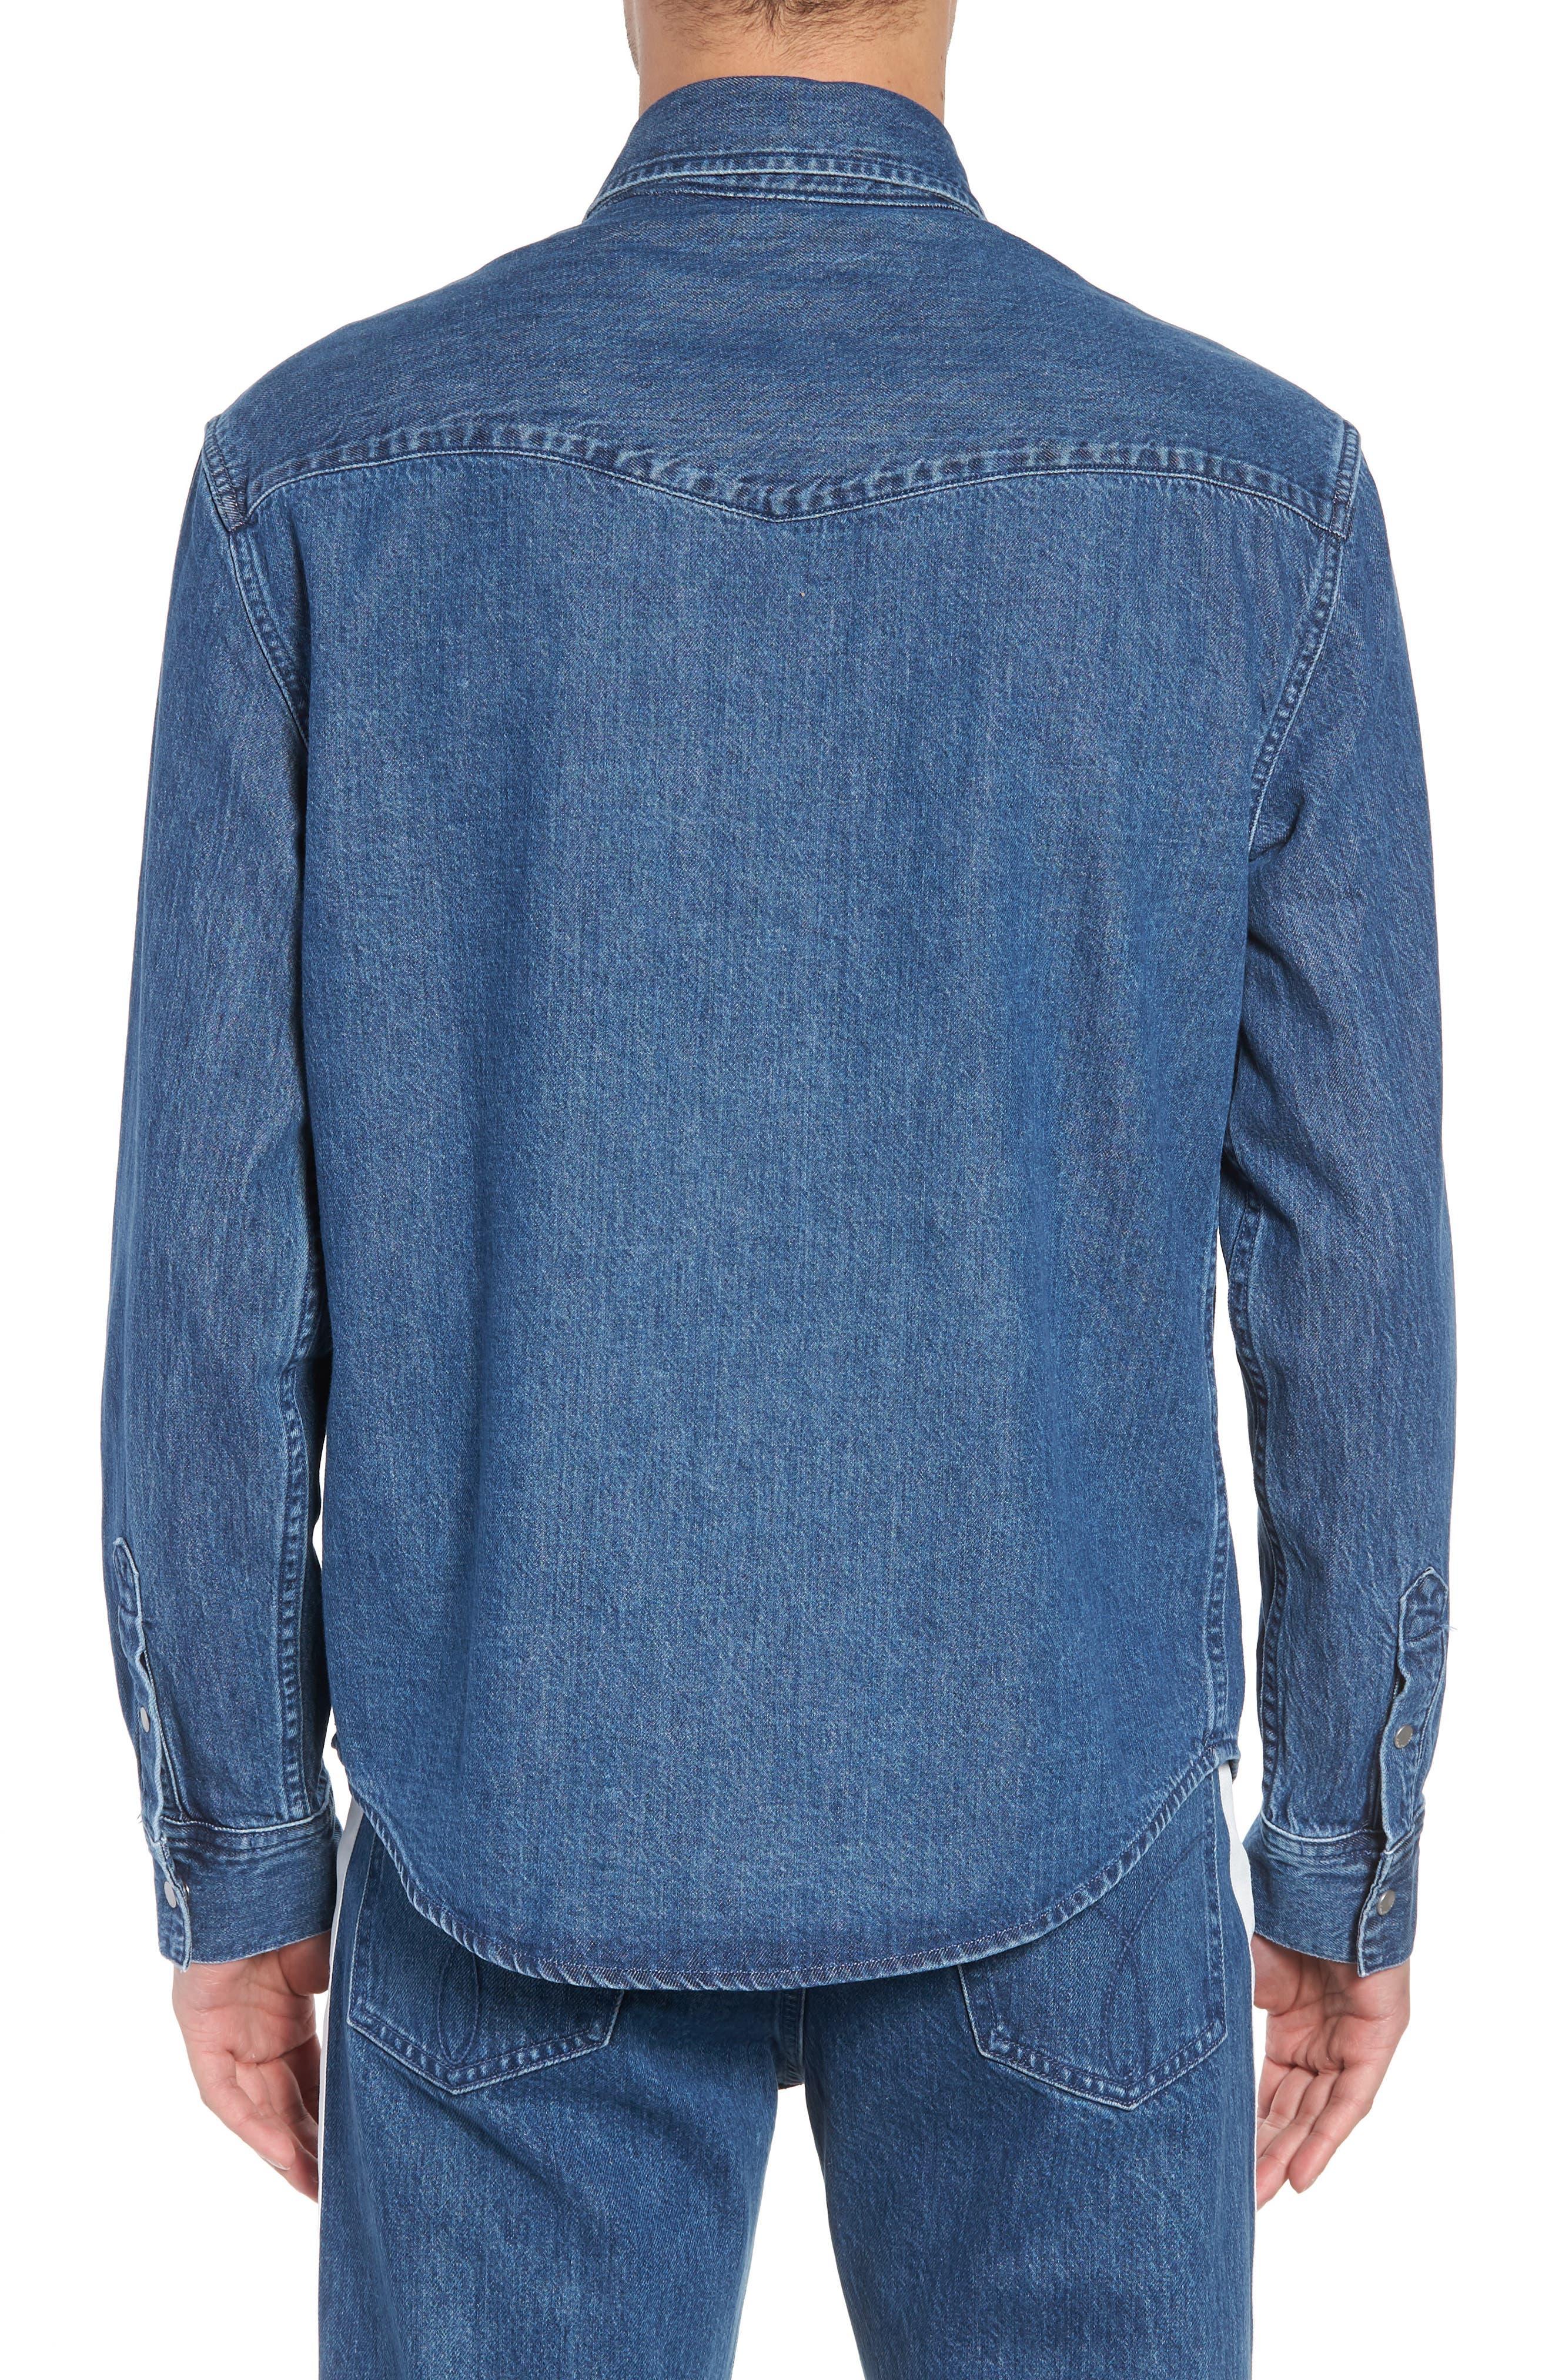 Calvin Klein Archive Colorblock Denim Western Shirt,                             Alternate thumbnail 2, color,                             400